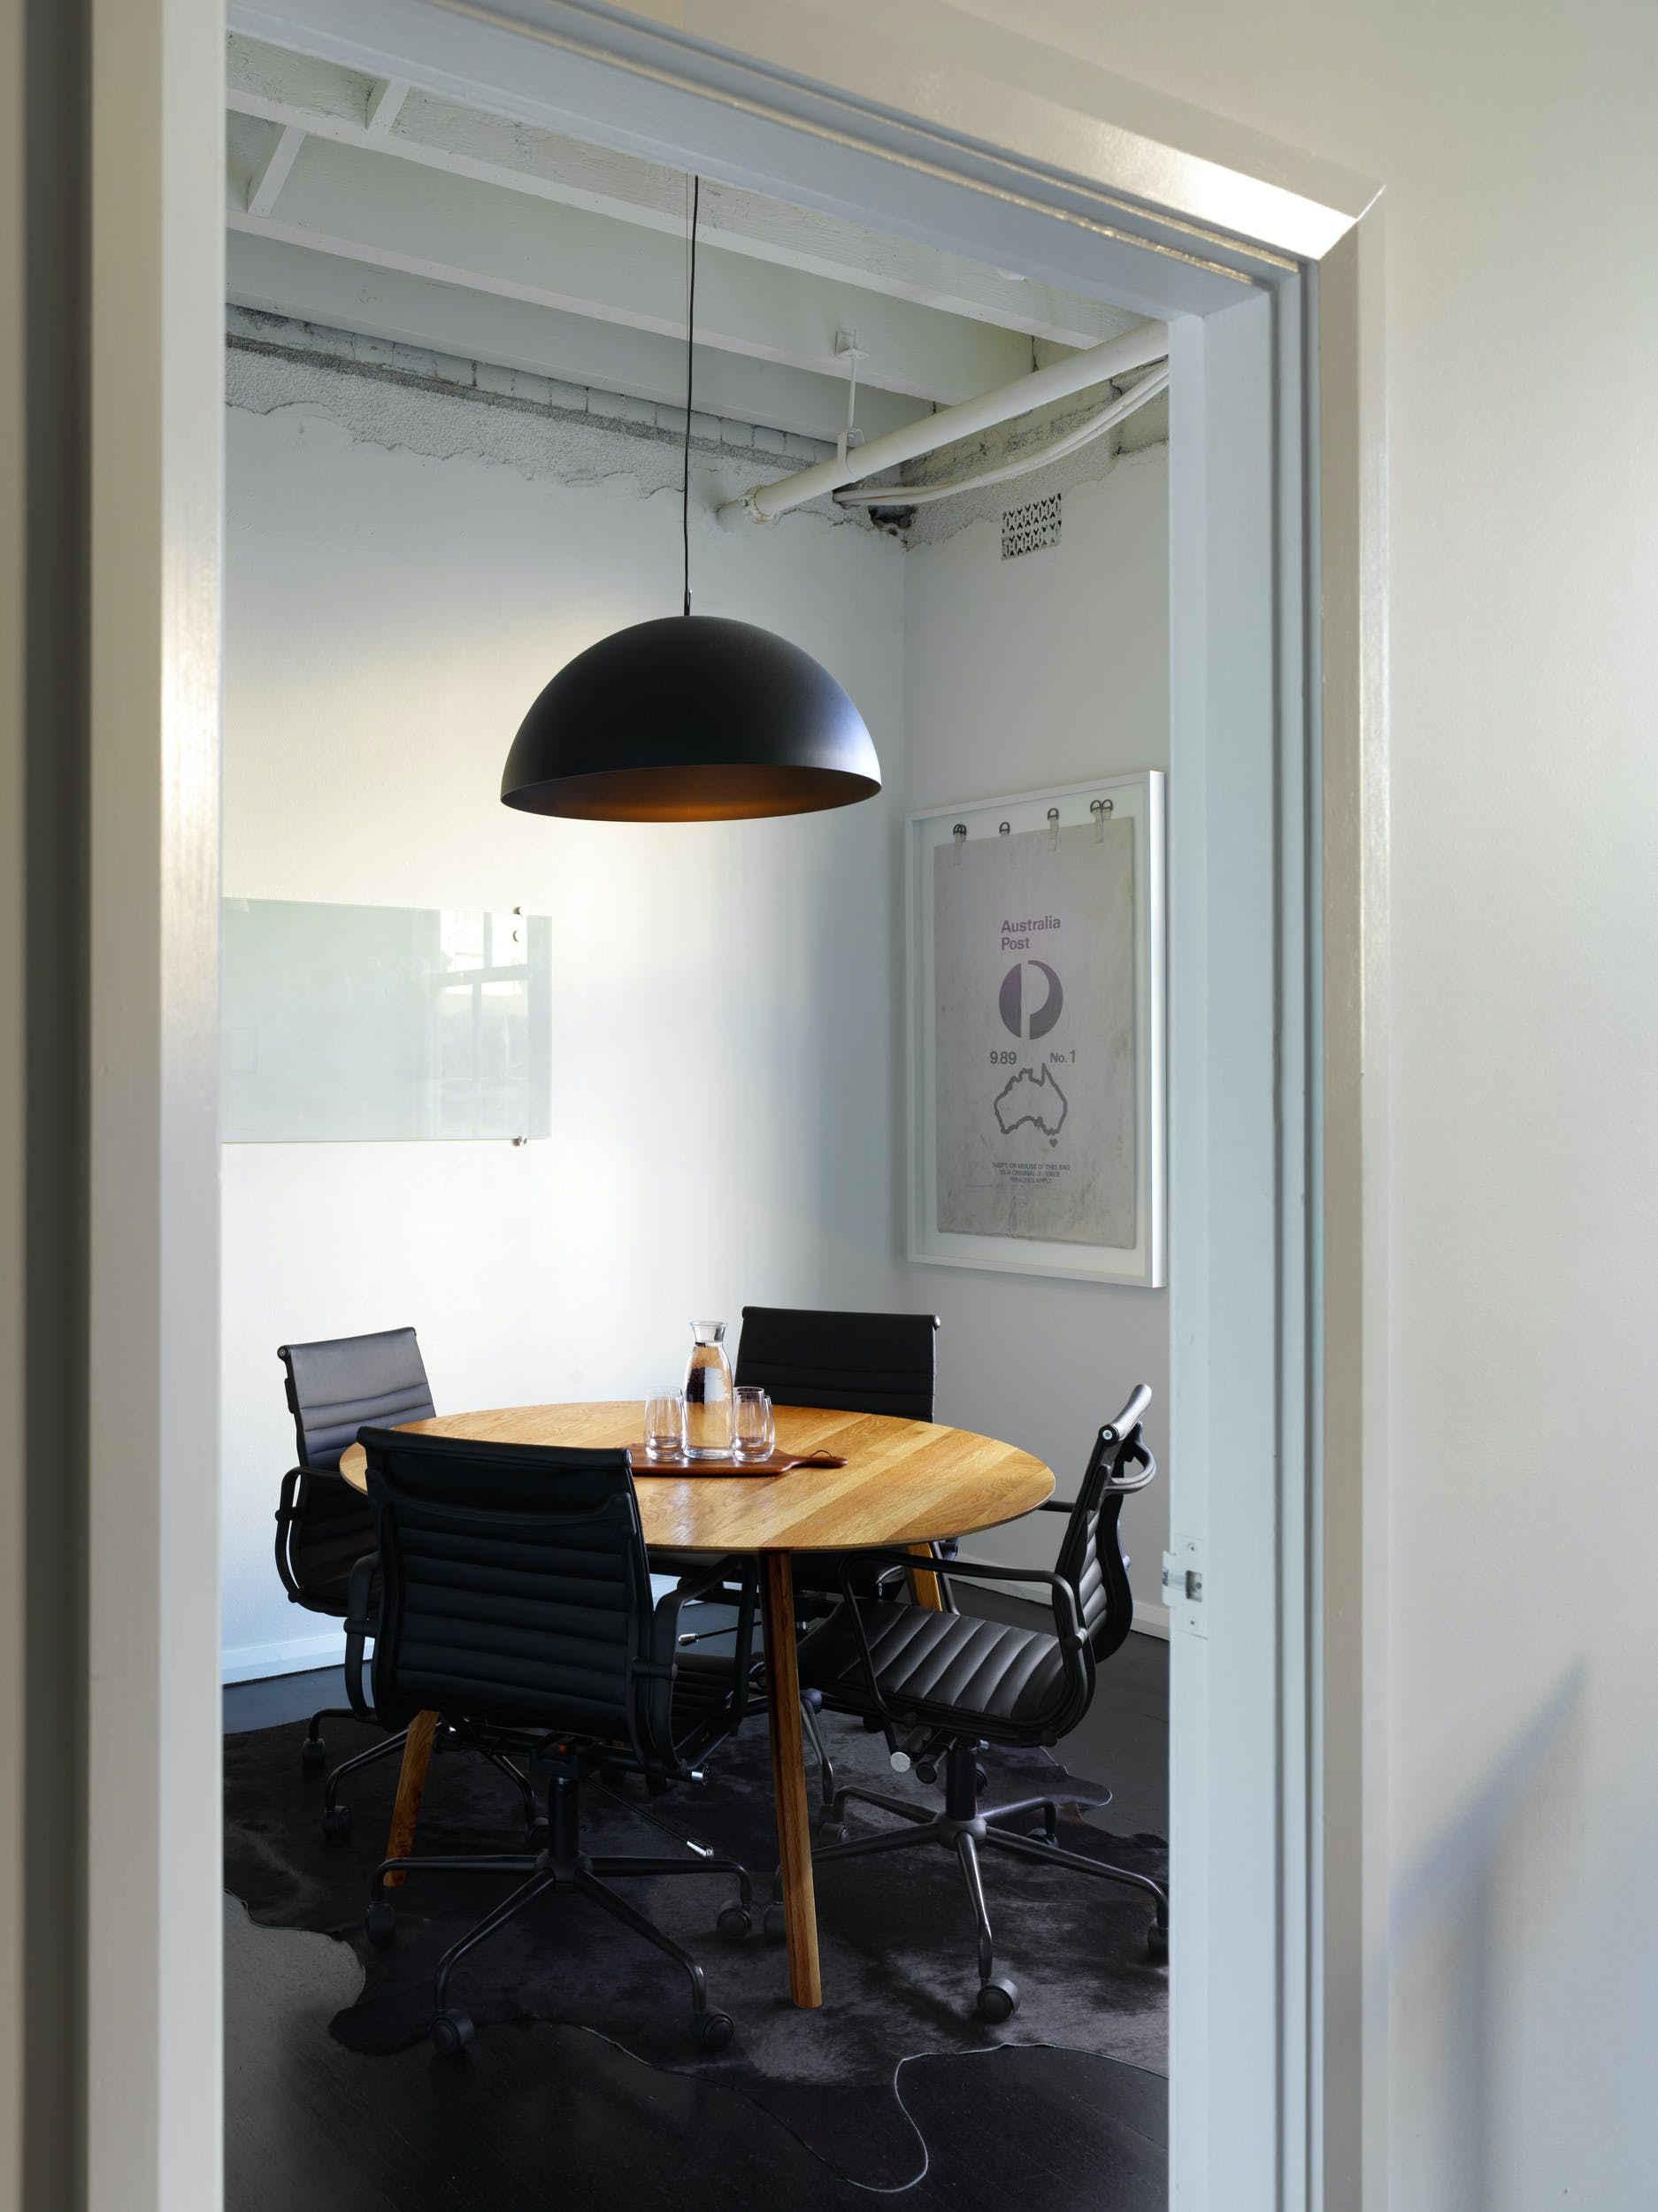 Bourke, meeting room at Desk Space, image 1